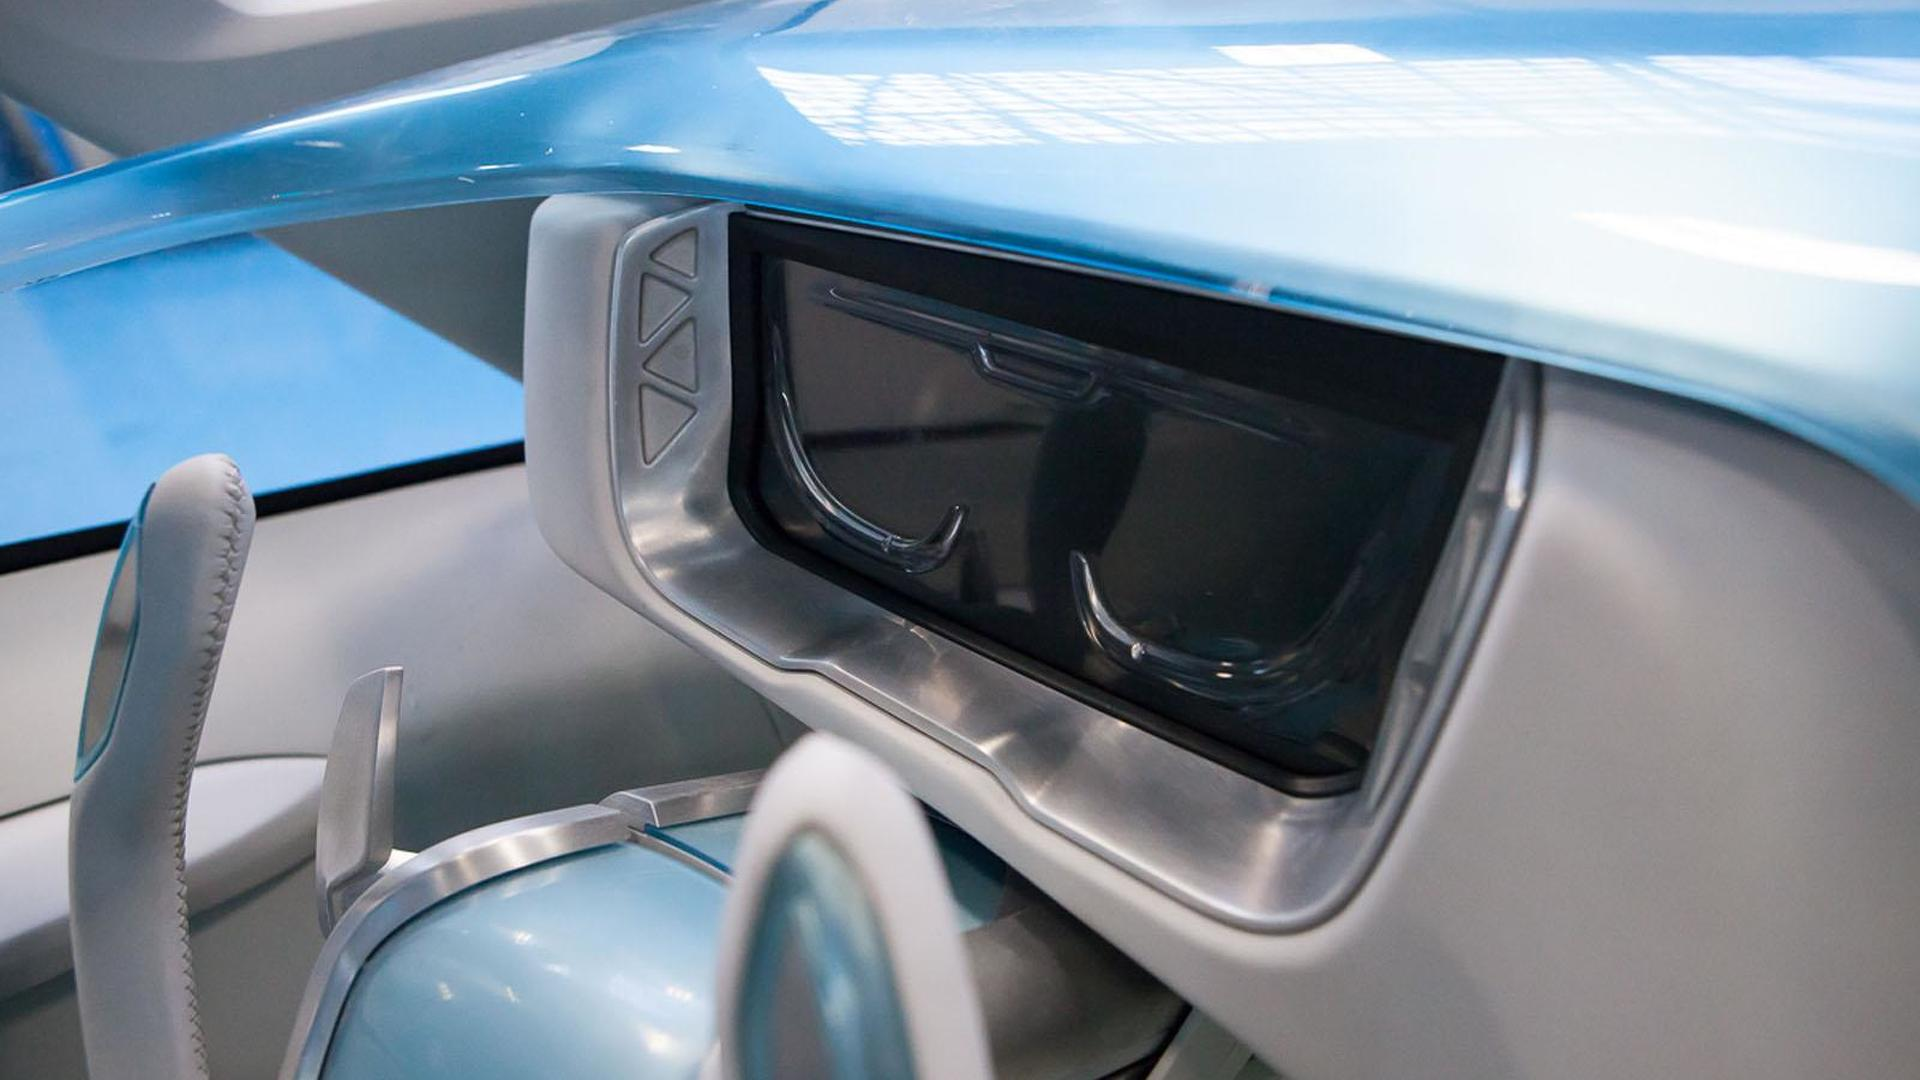 Руль Iveco Vision как штурвал самолета